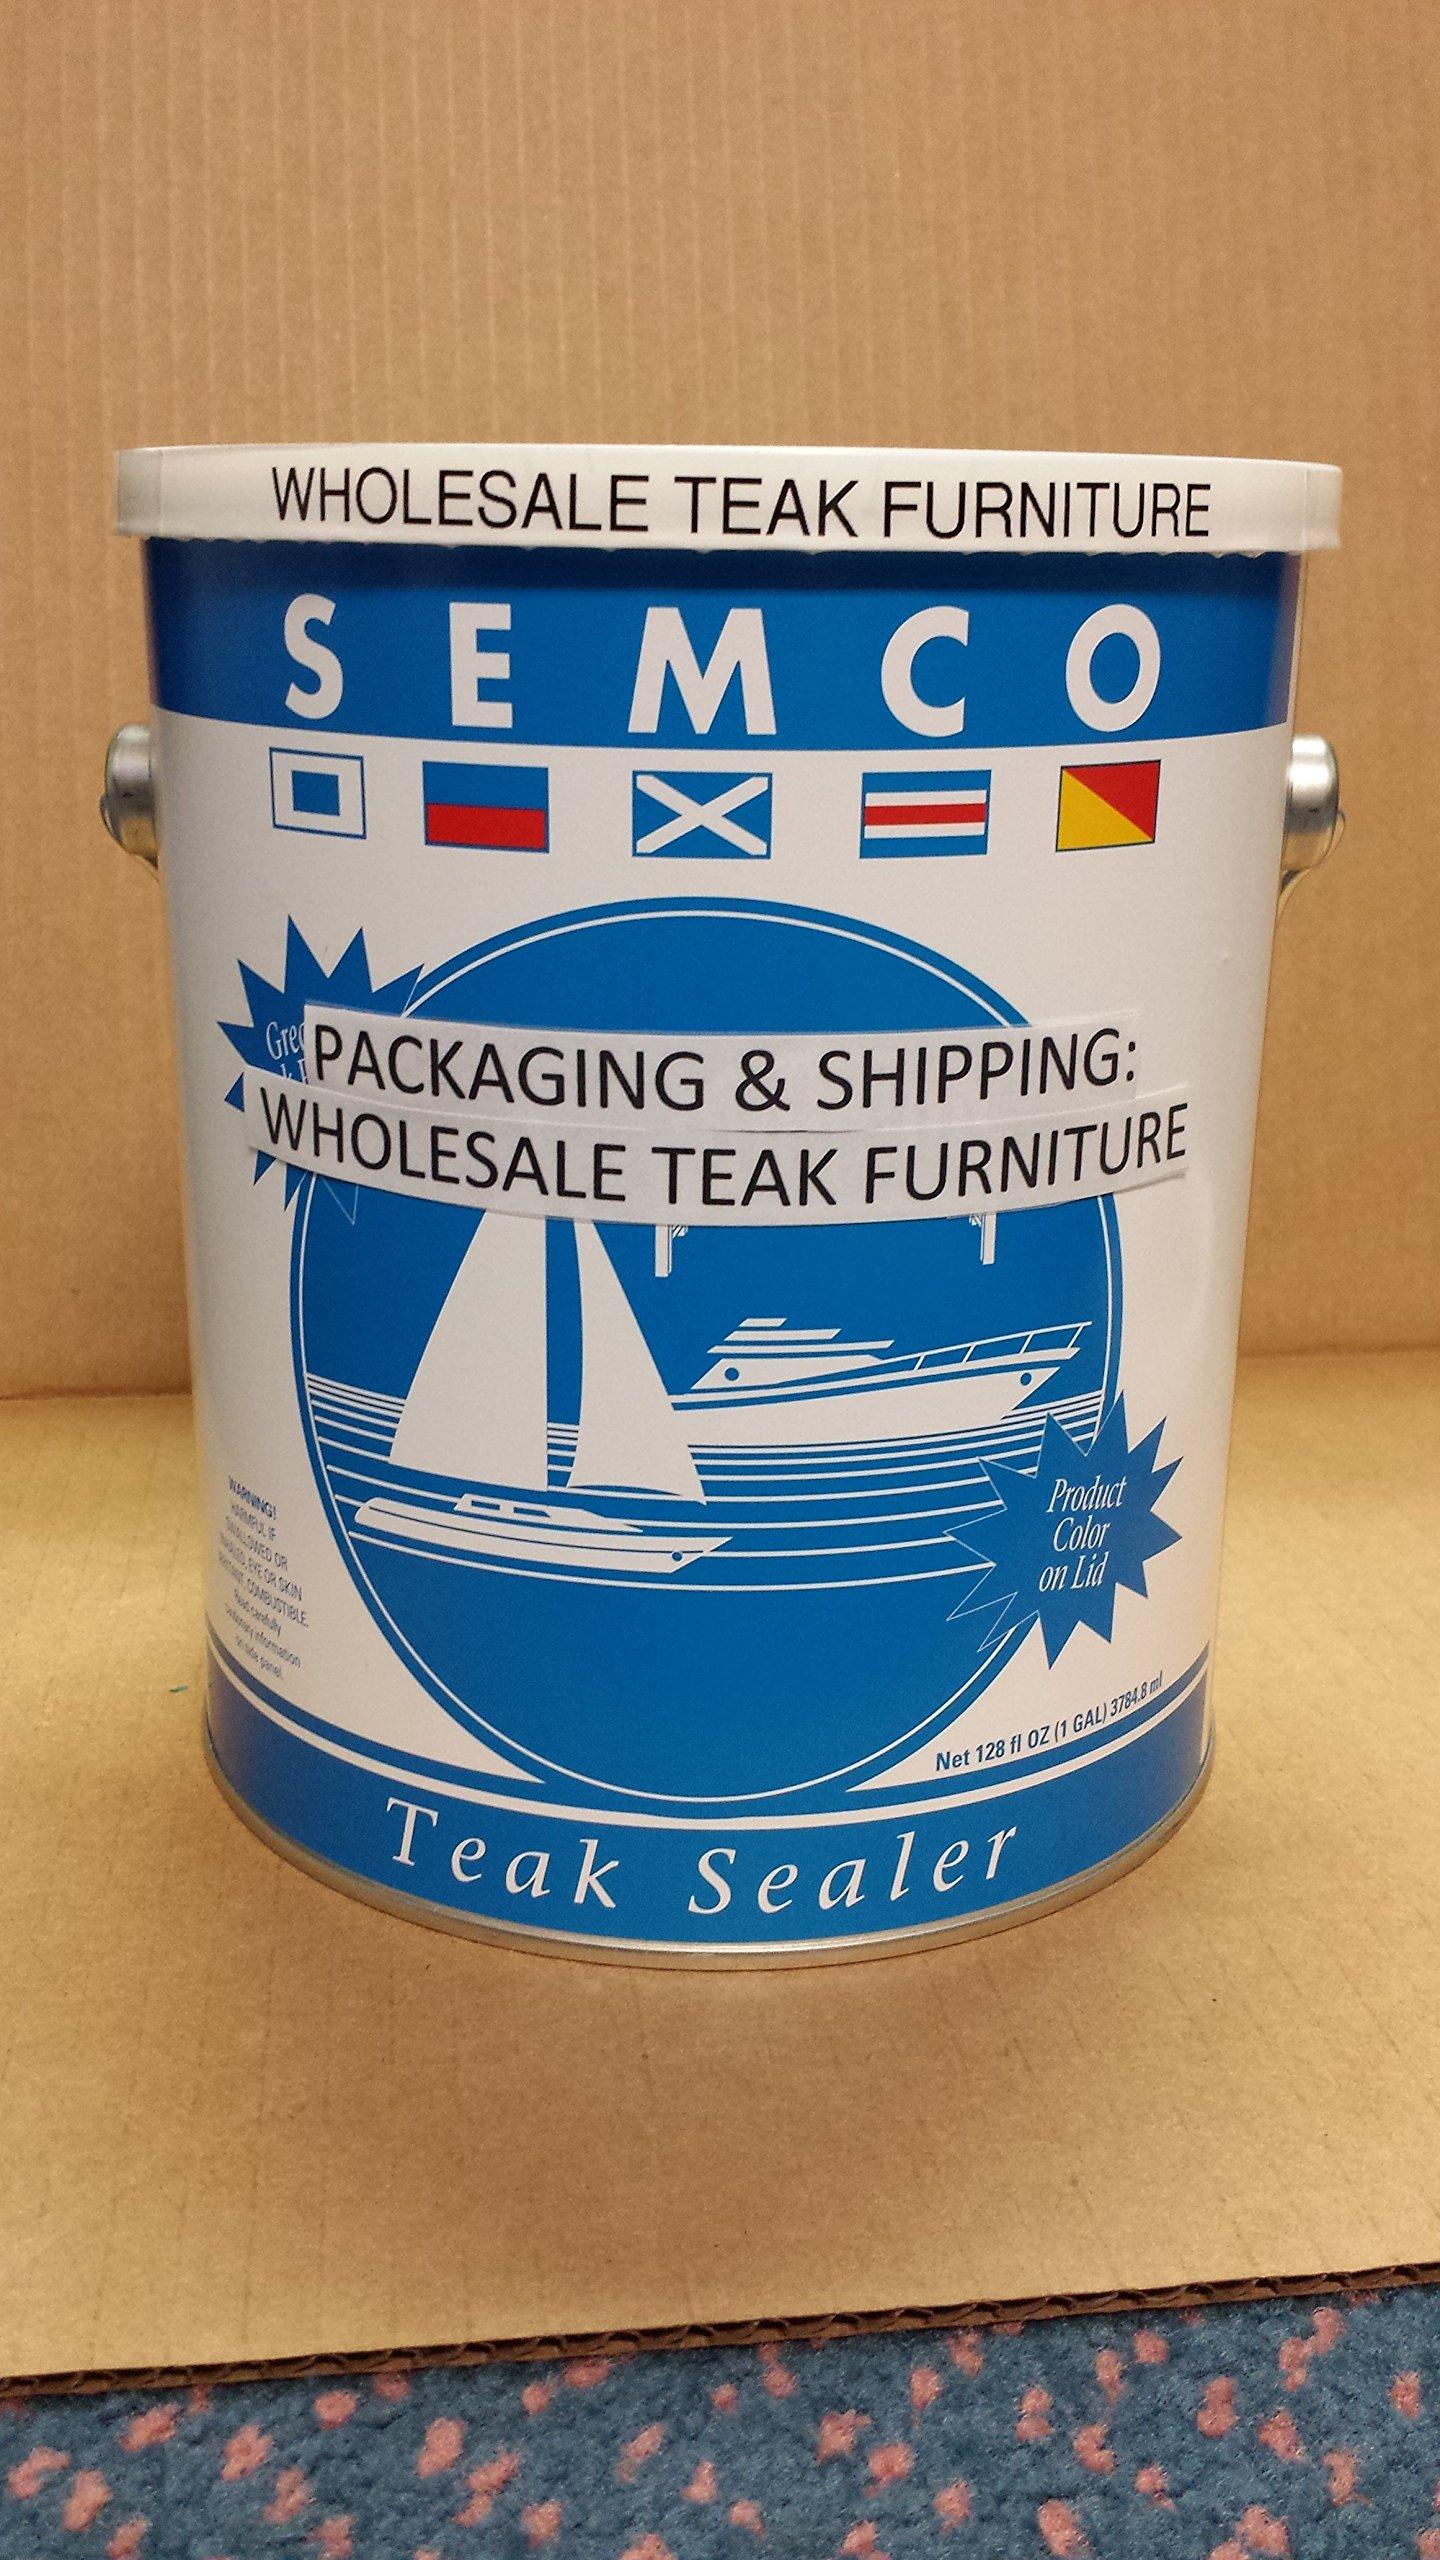 TeakStation Semco Teak Sealer 1 Gallon Honey Tone Finish Sealant Protector